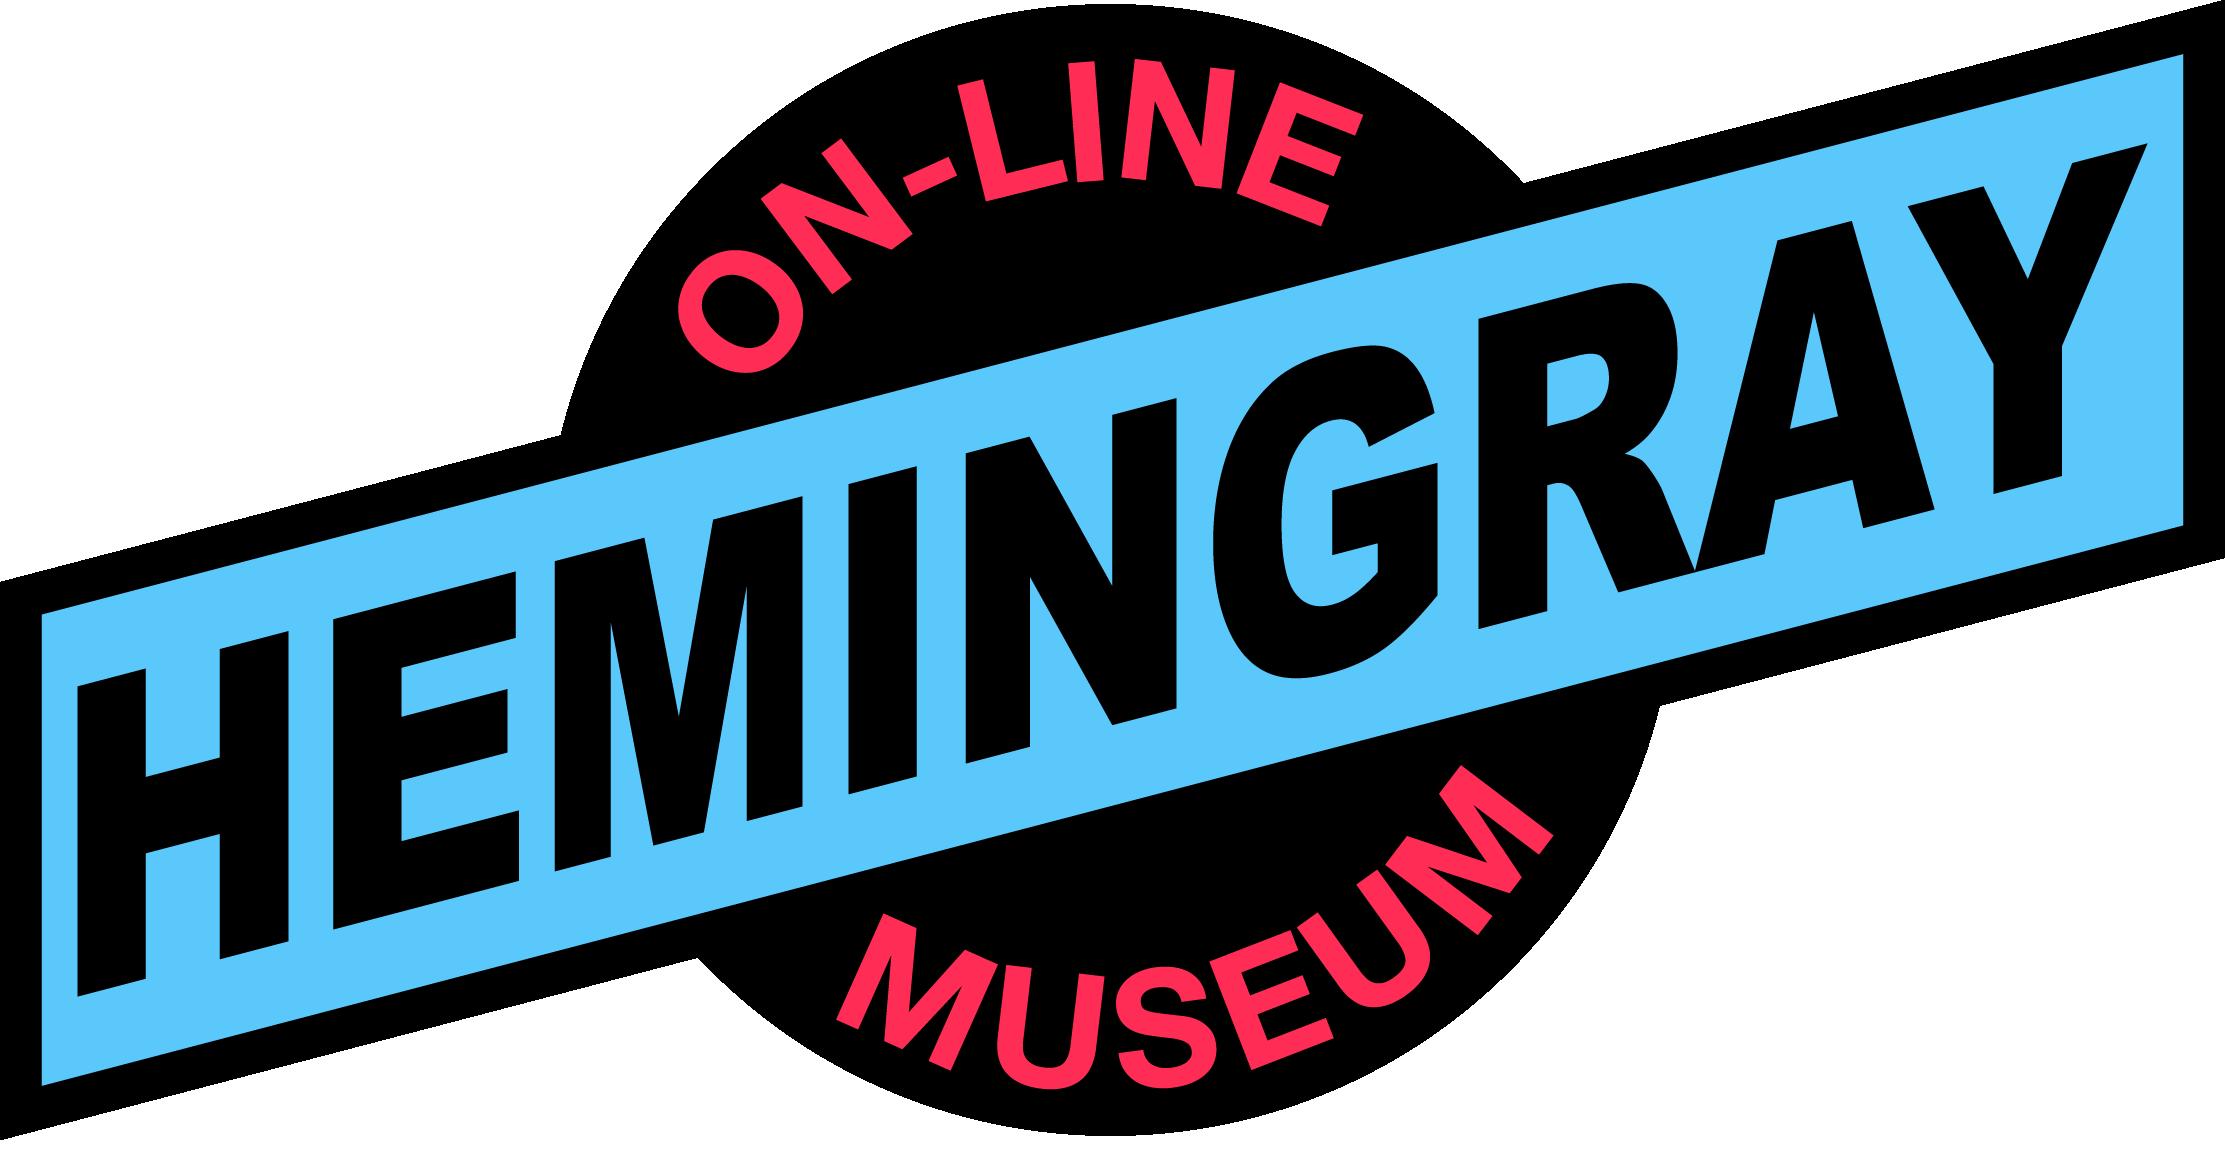 Hemingray On Line Musueum Logo